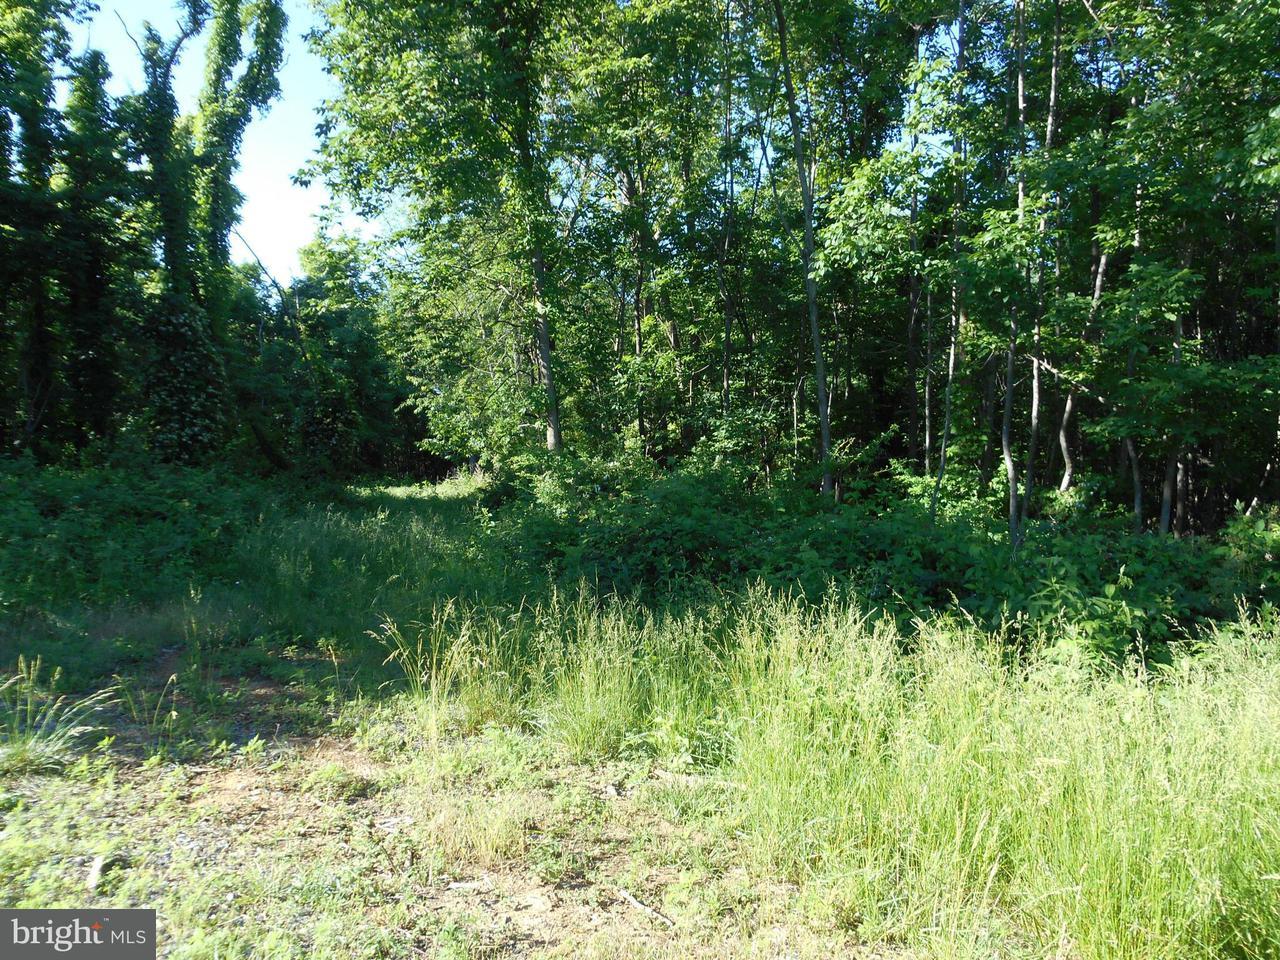 Land for Sale at Lot 63 Savannah Dr Strasburg, Virginia 22657 United States